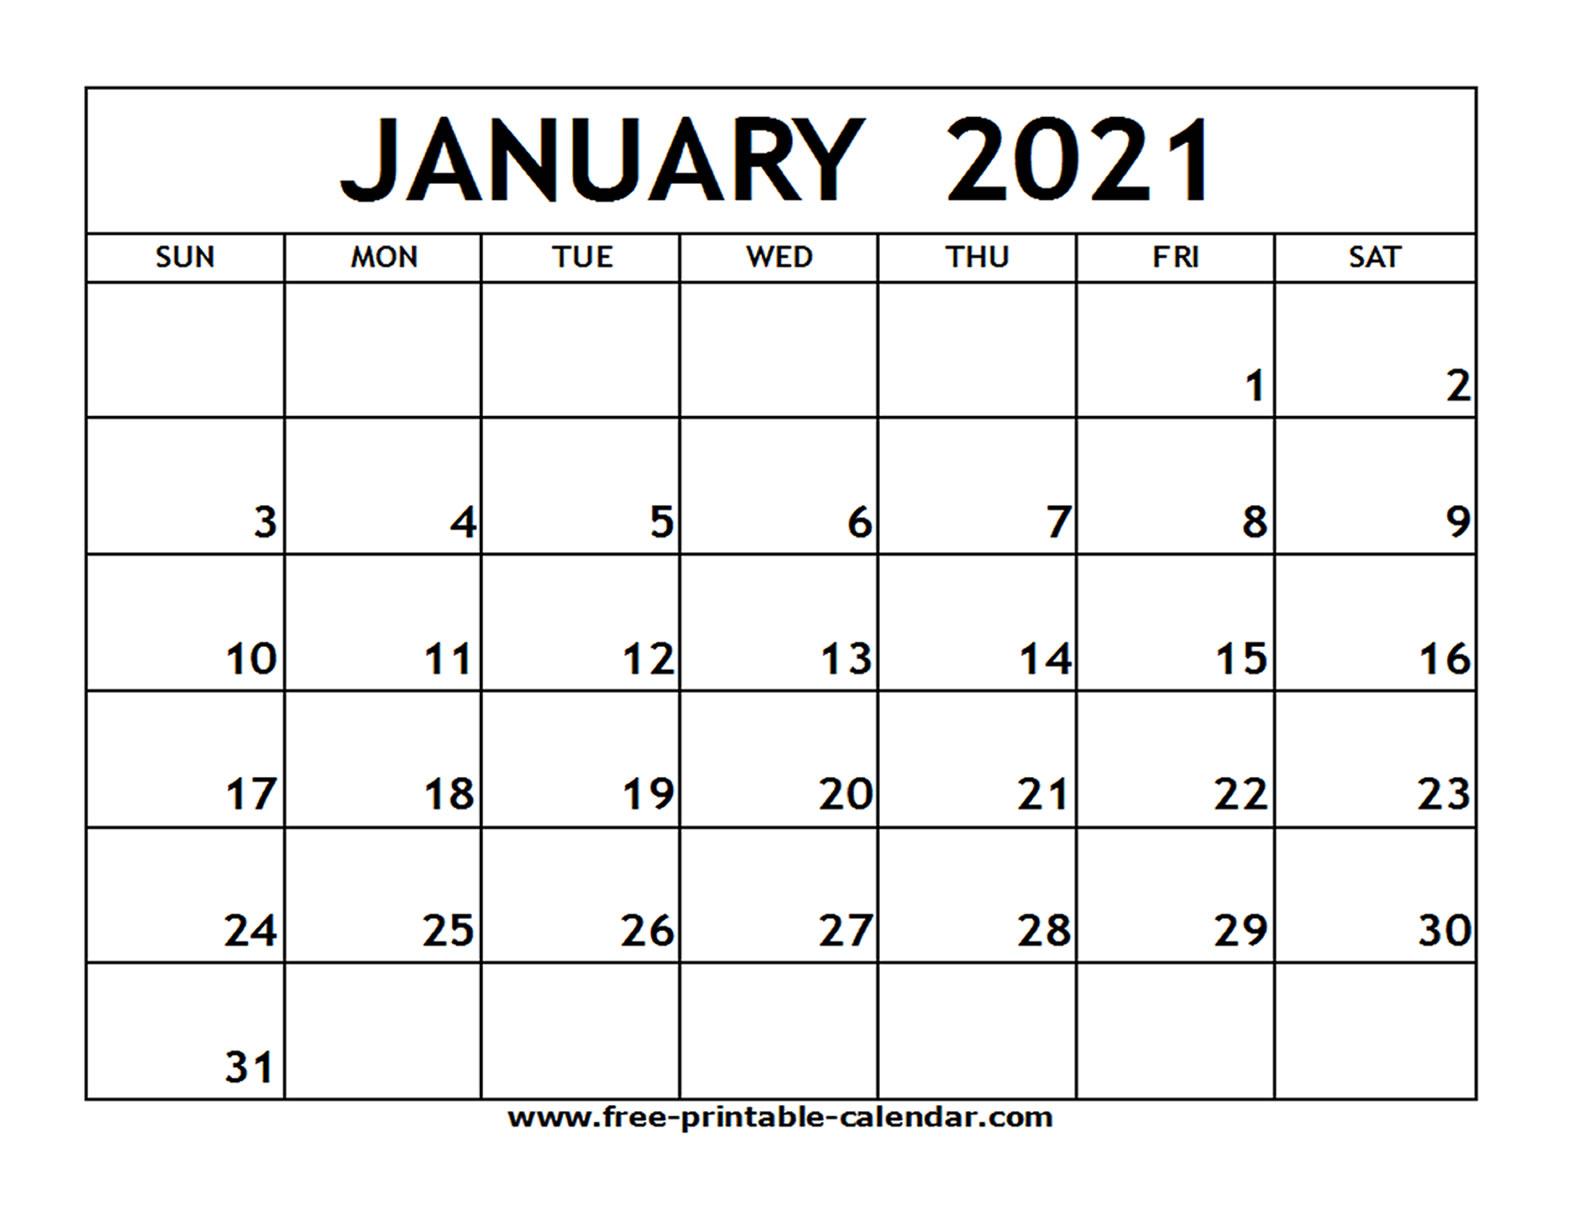 January 2021 Printable Calendar - Free-Printable-Calendar with Printable Blank Fill In Monthly Calendar 2021